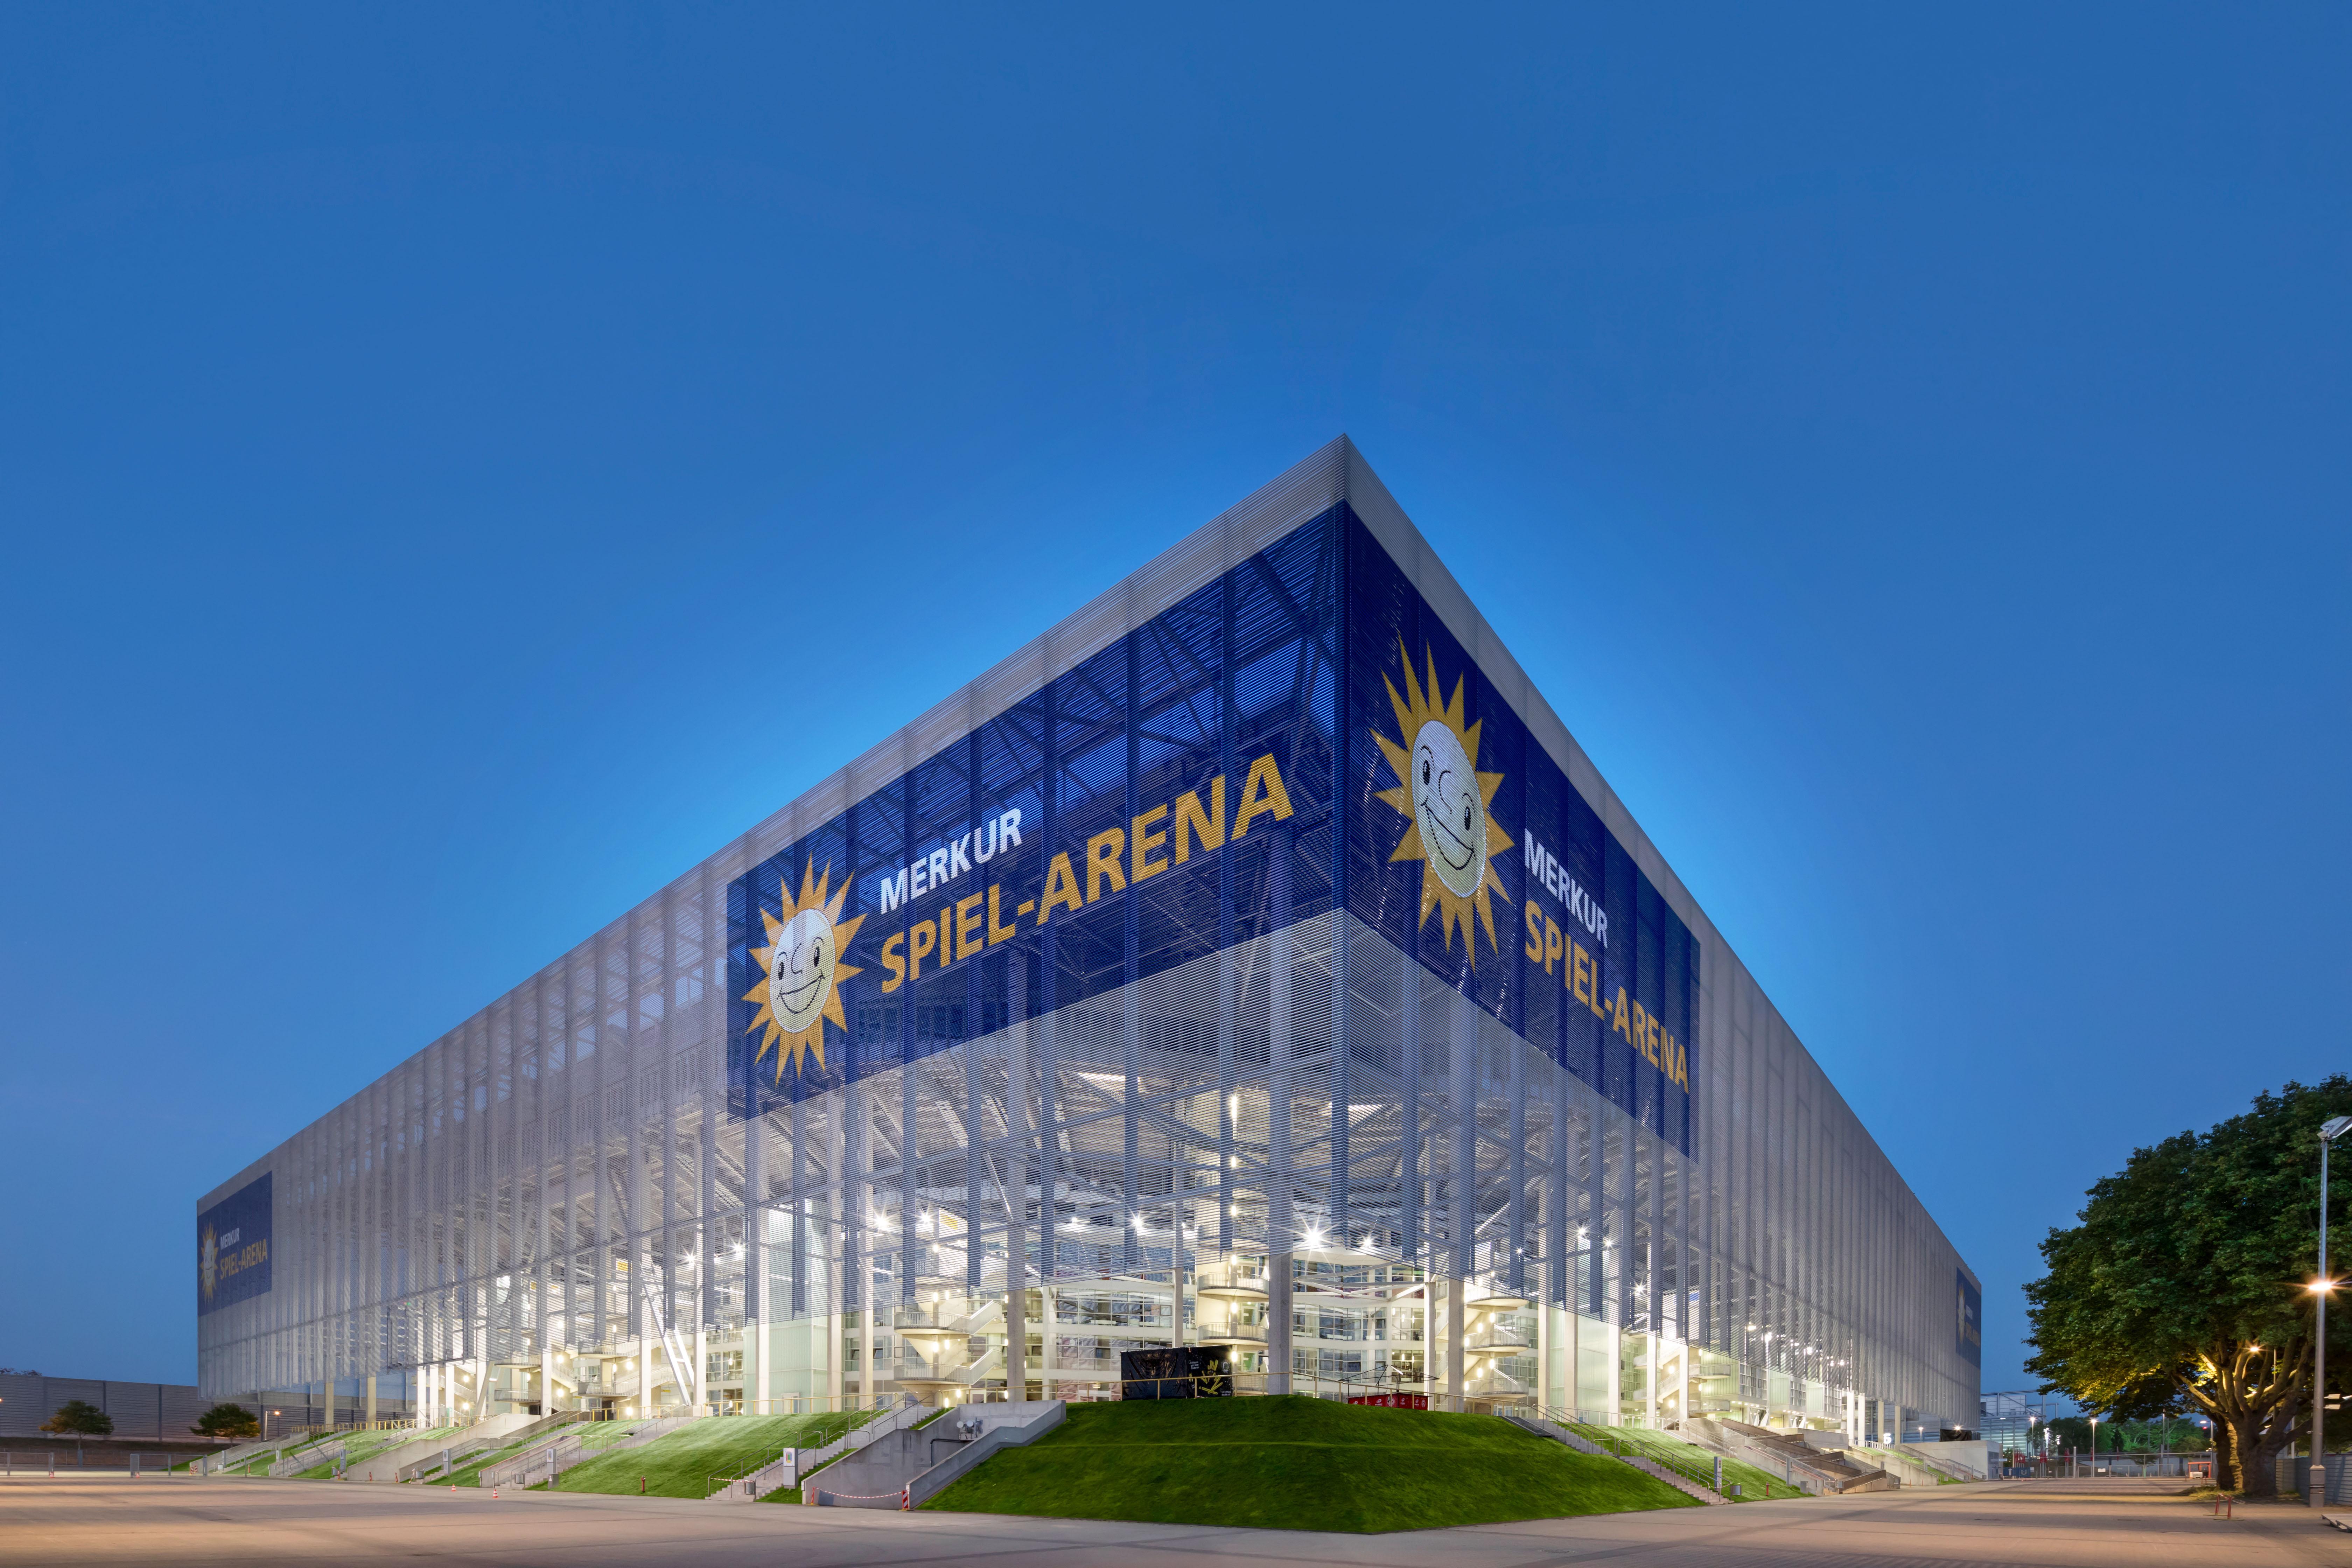 Arena Spiele